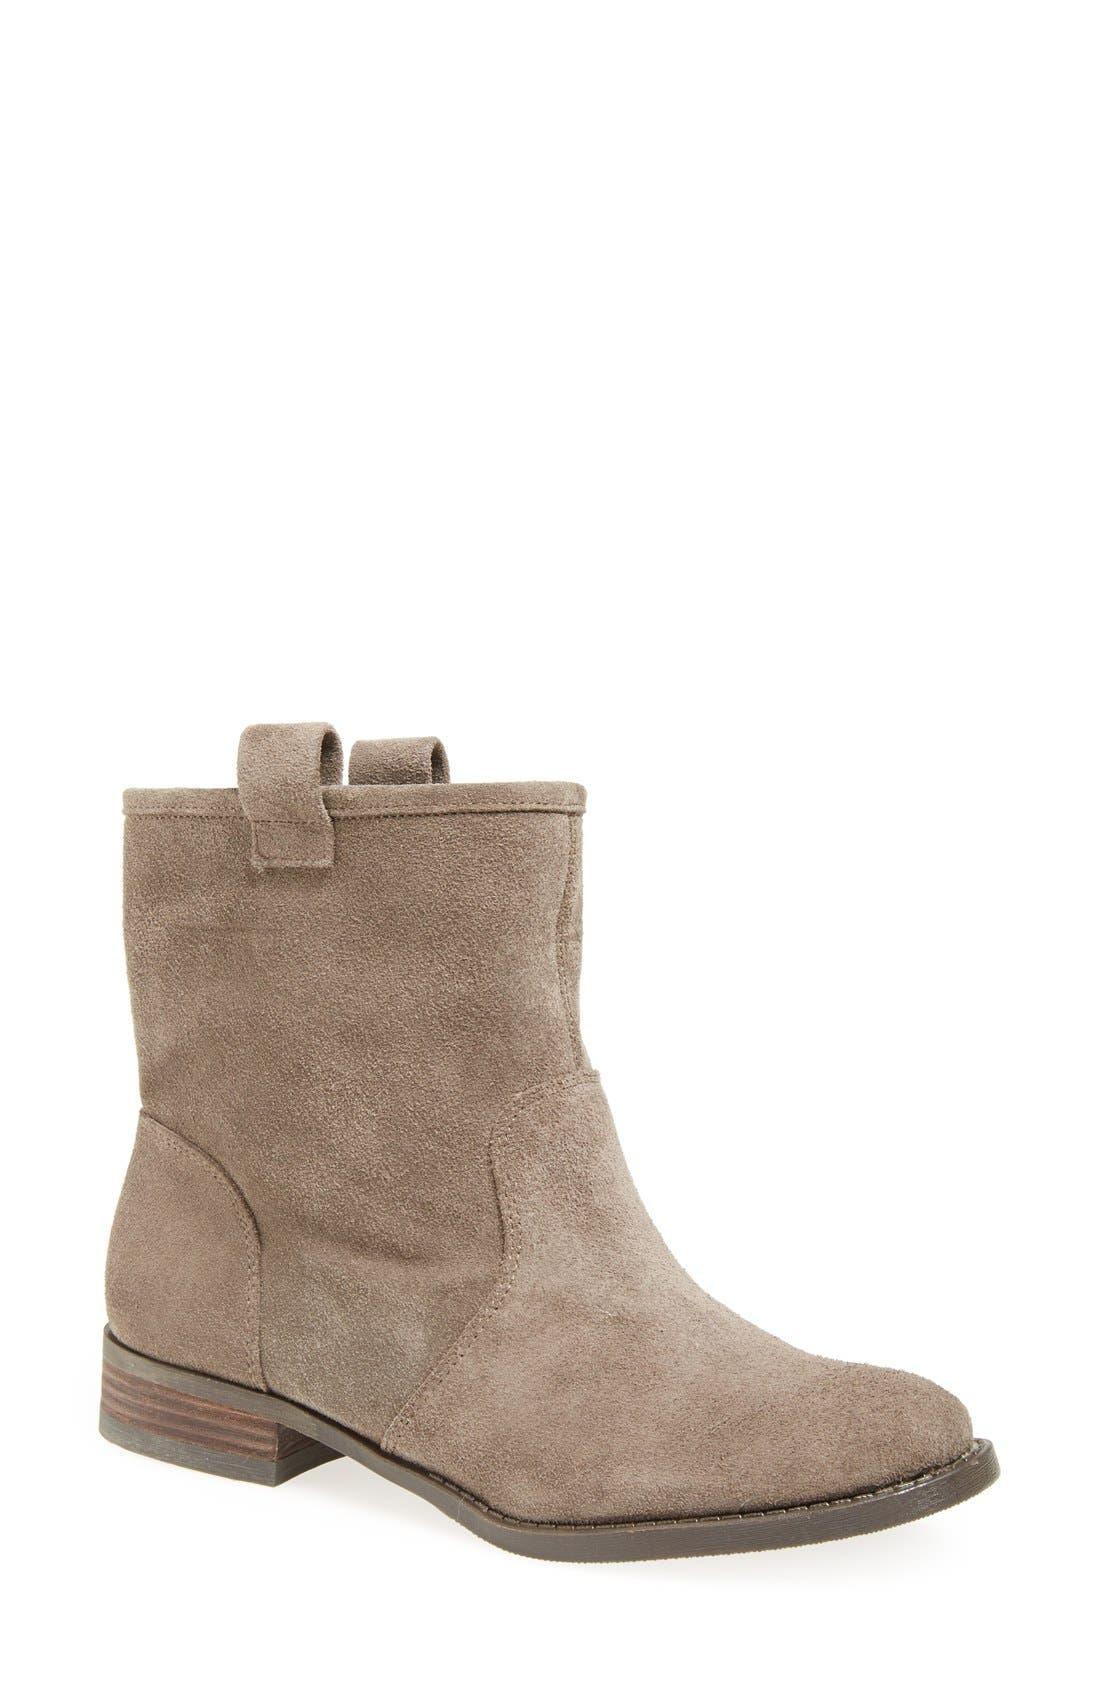 Alternate Image 1 Selected - Sole Society 'Natasha' Boot (Women)